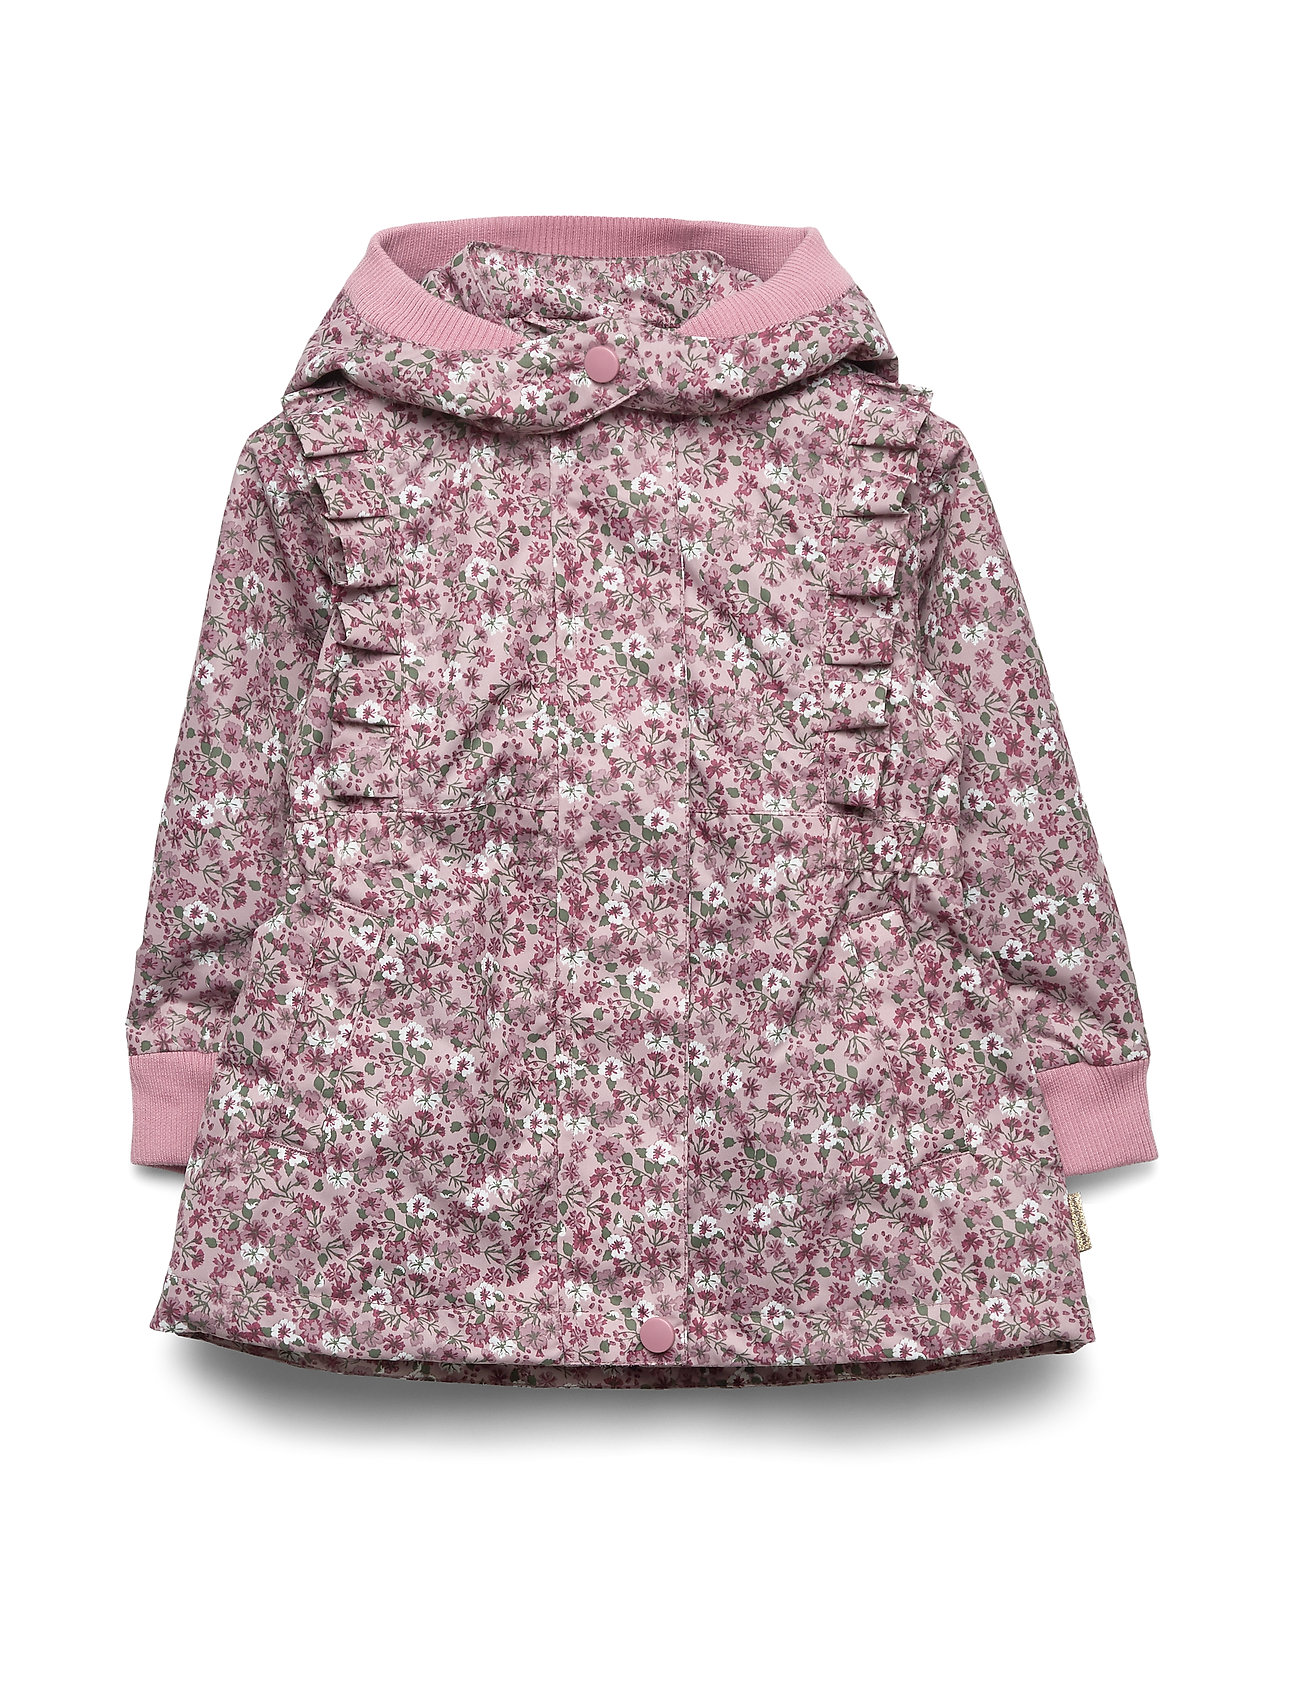 Image of Ofelise - Jacket Outerwear Rainwear Jackets Lyserød Hust & Claire (3342687215)